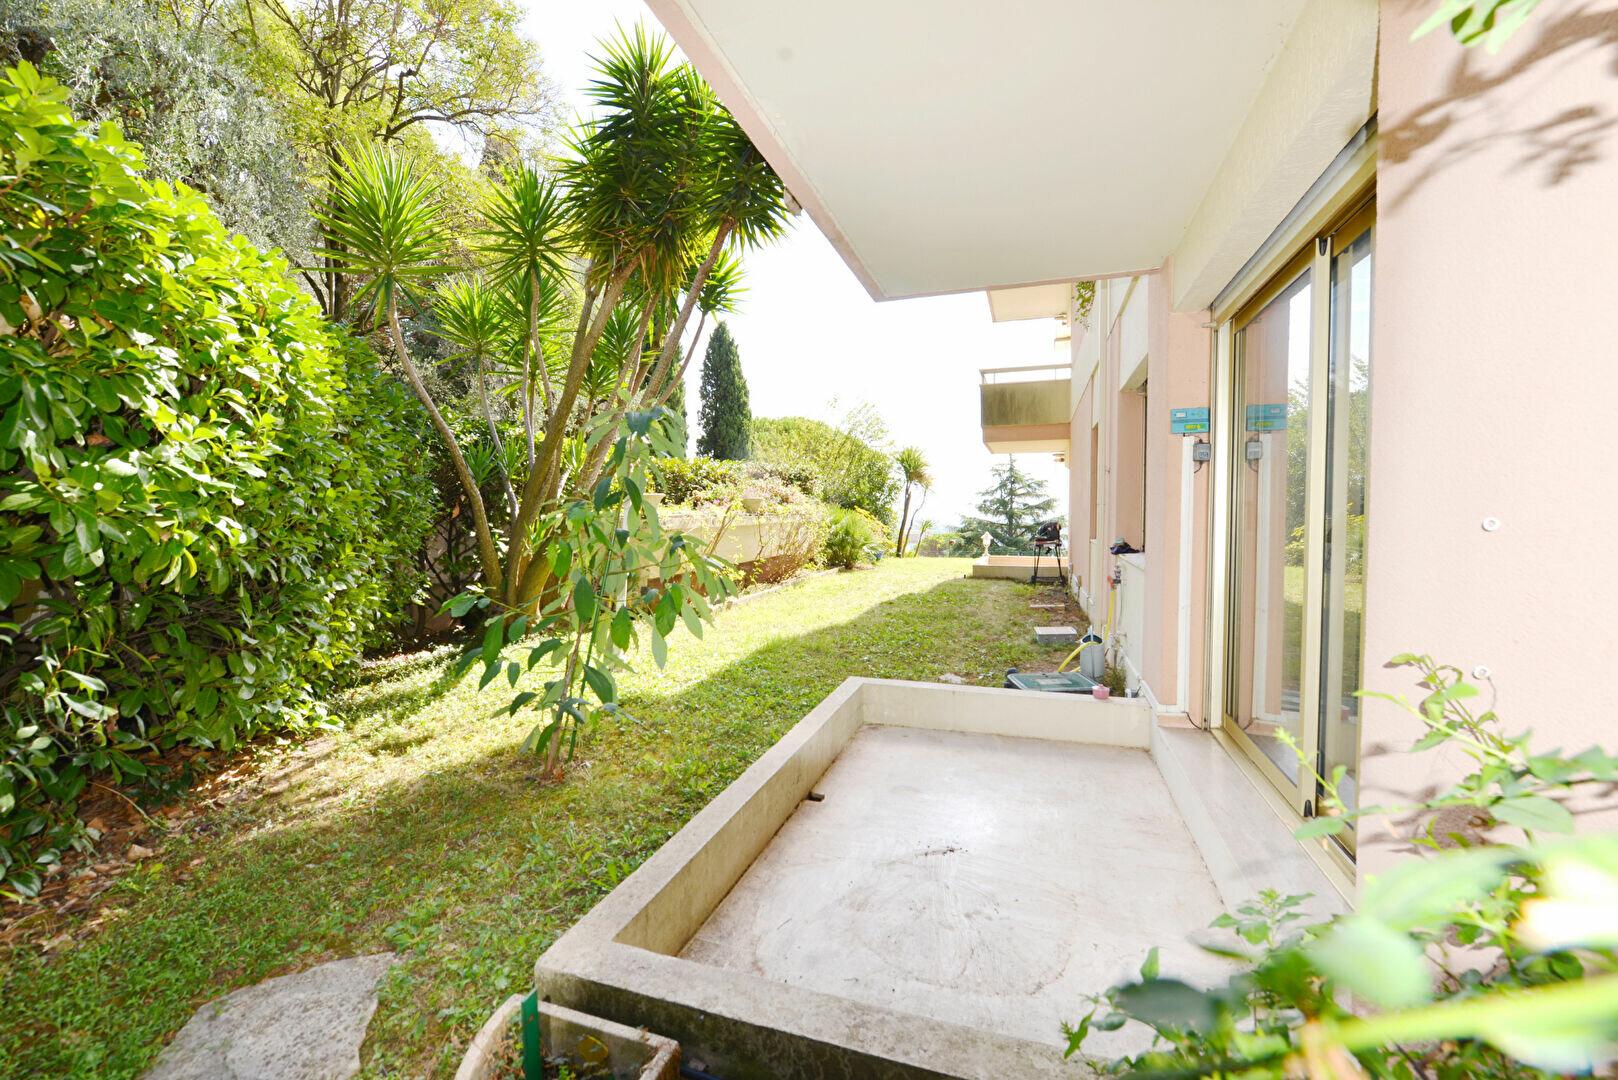 Appartement à vendre 3 69.3m2 à Grasse vignette-9